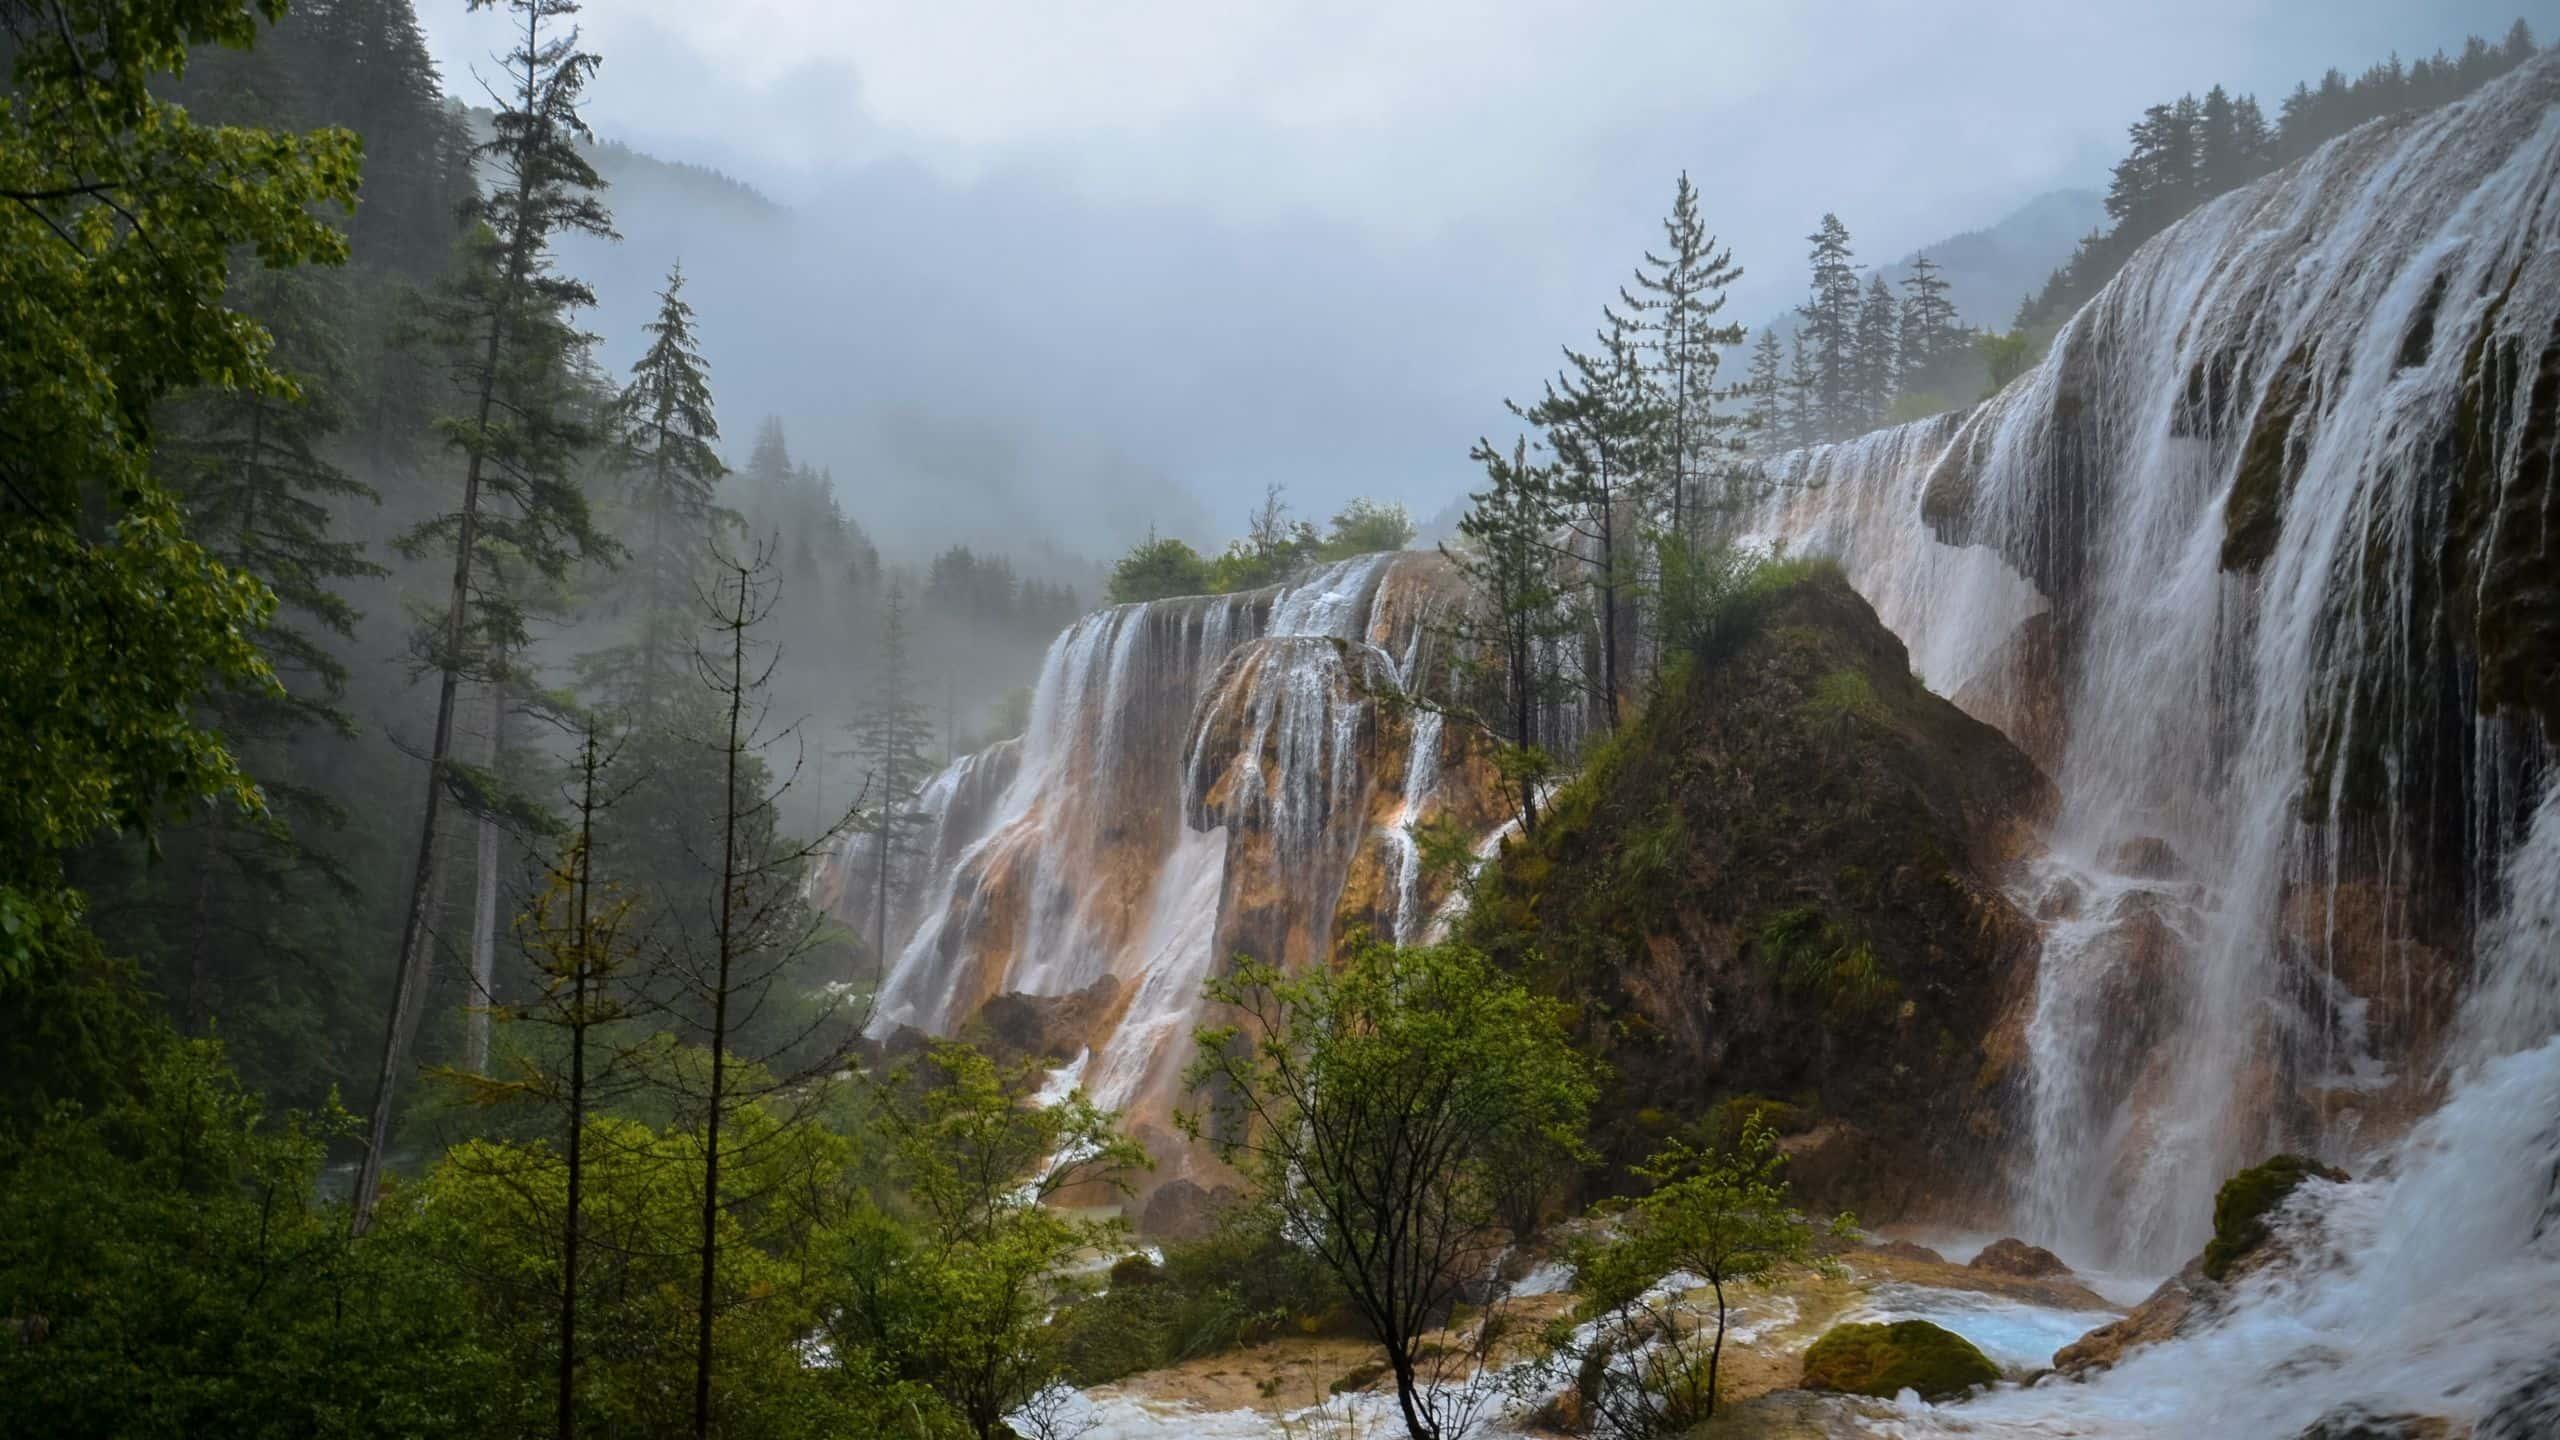 Impressive waterfalls at Aba, Sichuan